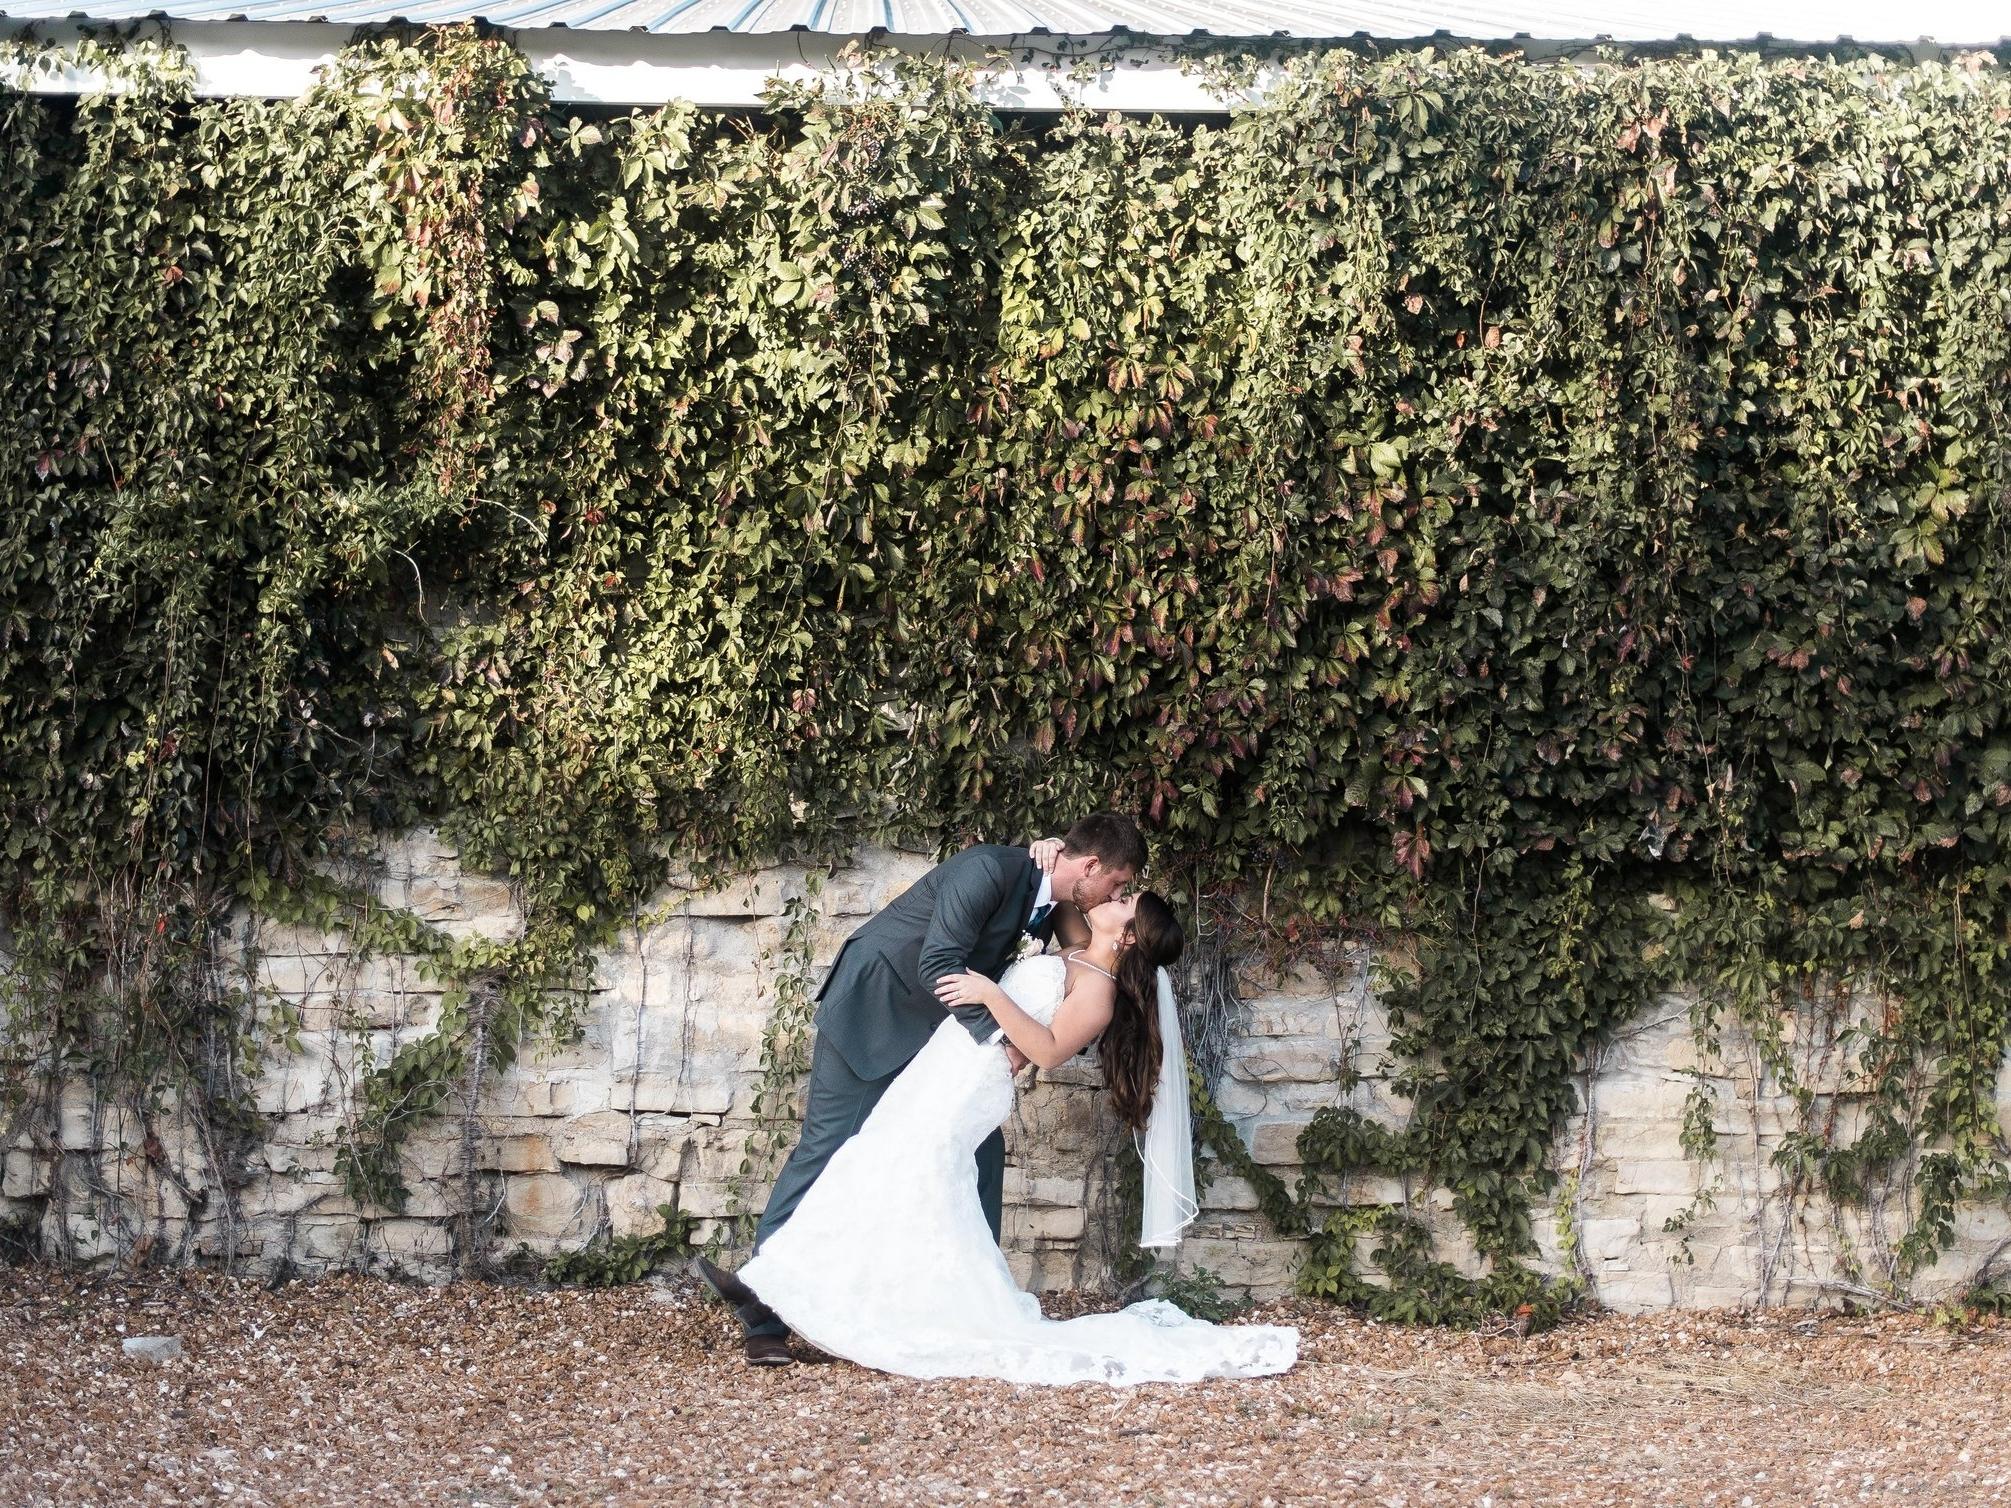 Danny Emma Simple Fairytale-Danny Emma Simple Fairytale-0343.jpg